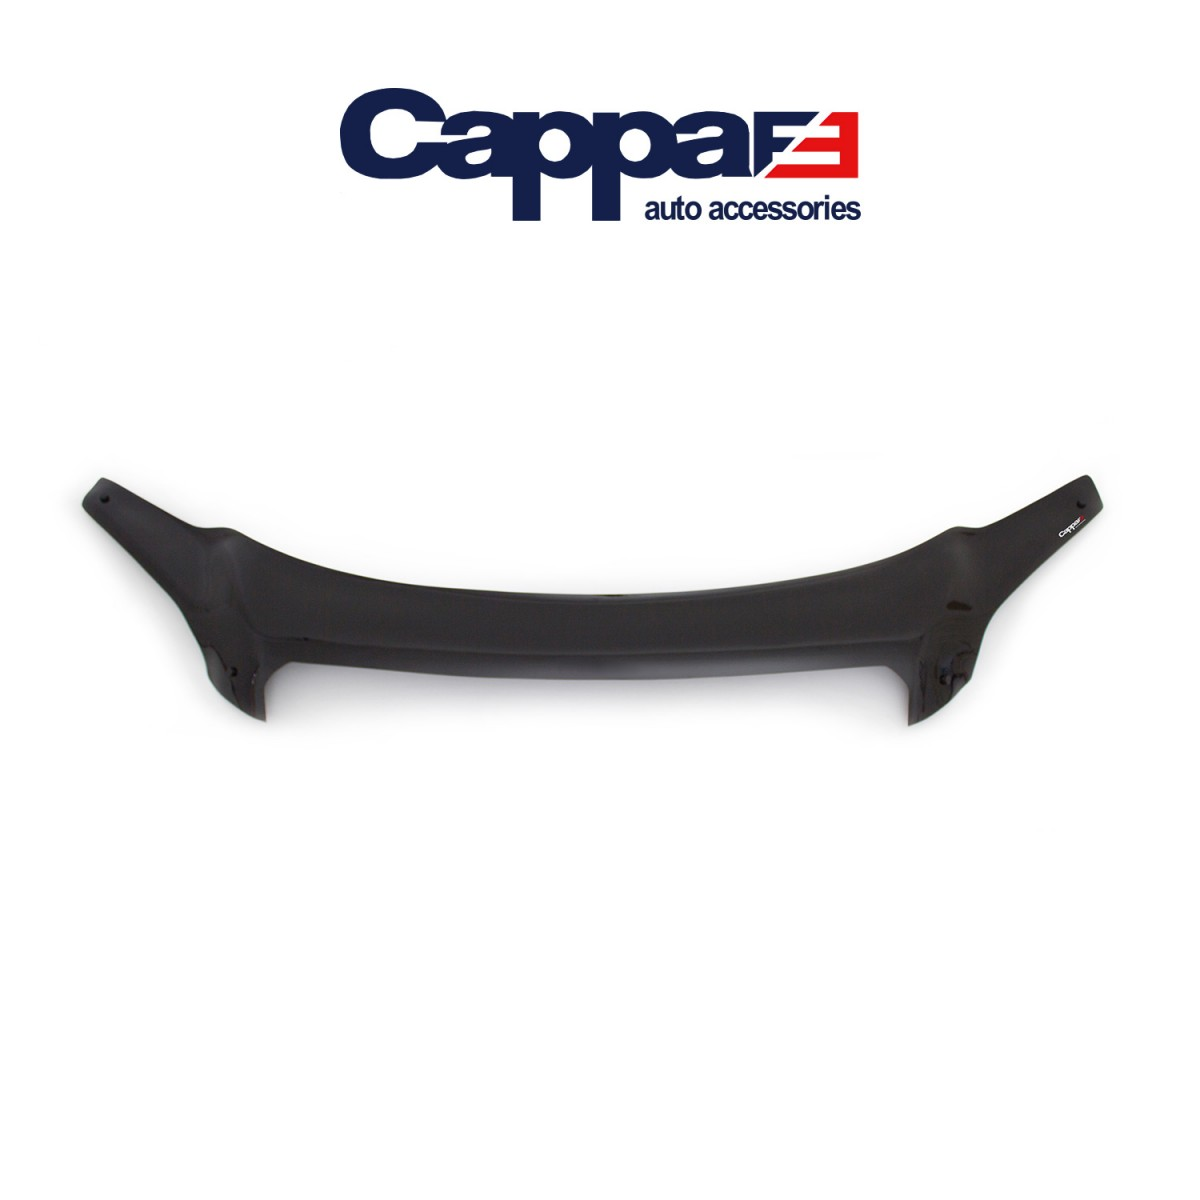 CAPPAFE Chevrolet Captiva Ön Kaput Koruyucu 4mm ABS 2006 - 2012